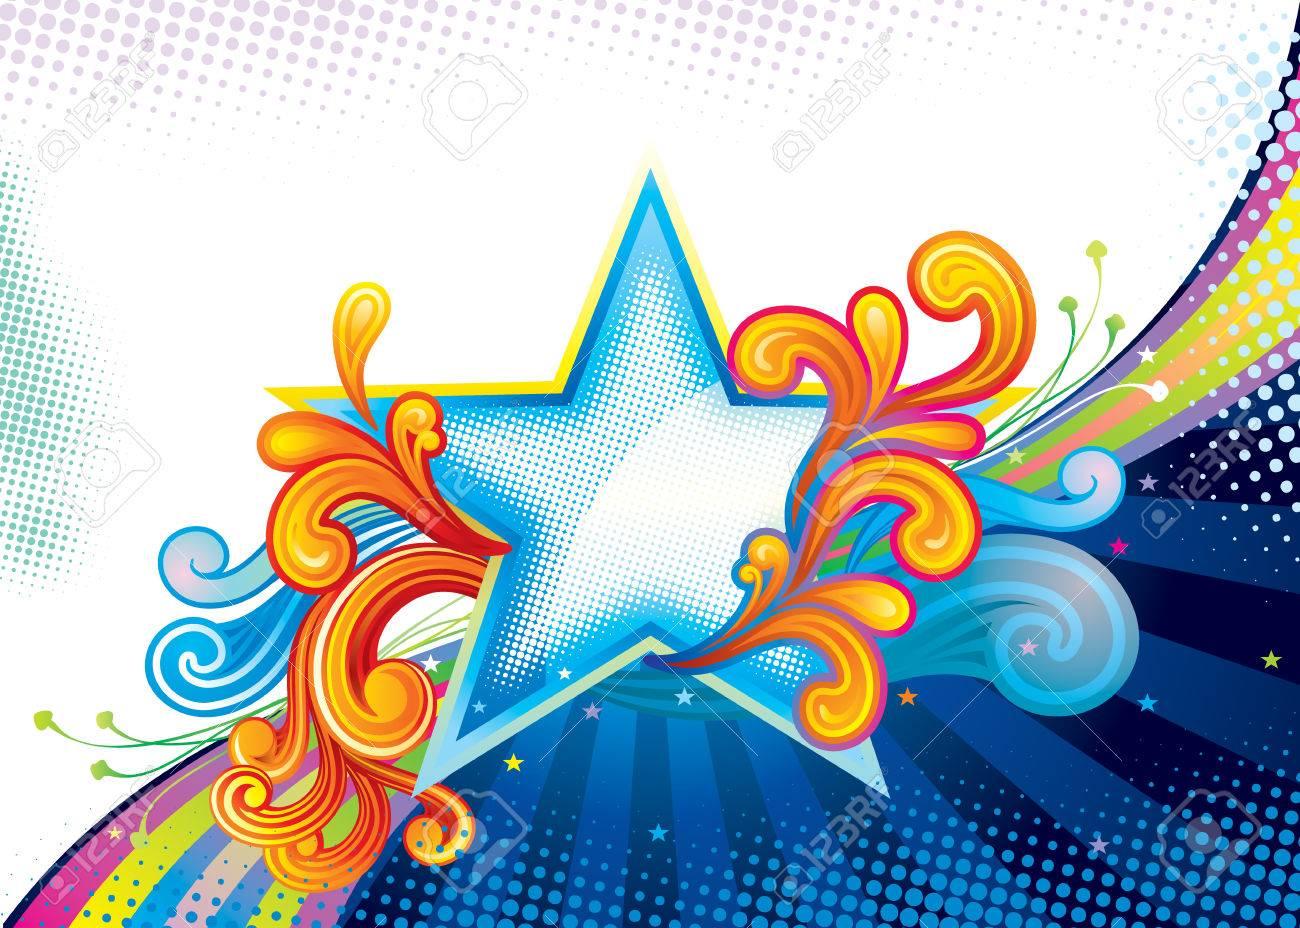 Elegance Star Shape, vector illustration layered file. Stock Vector - 3318410